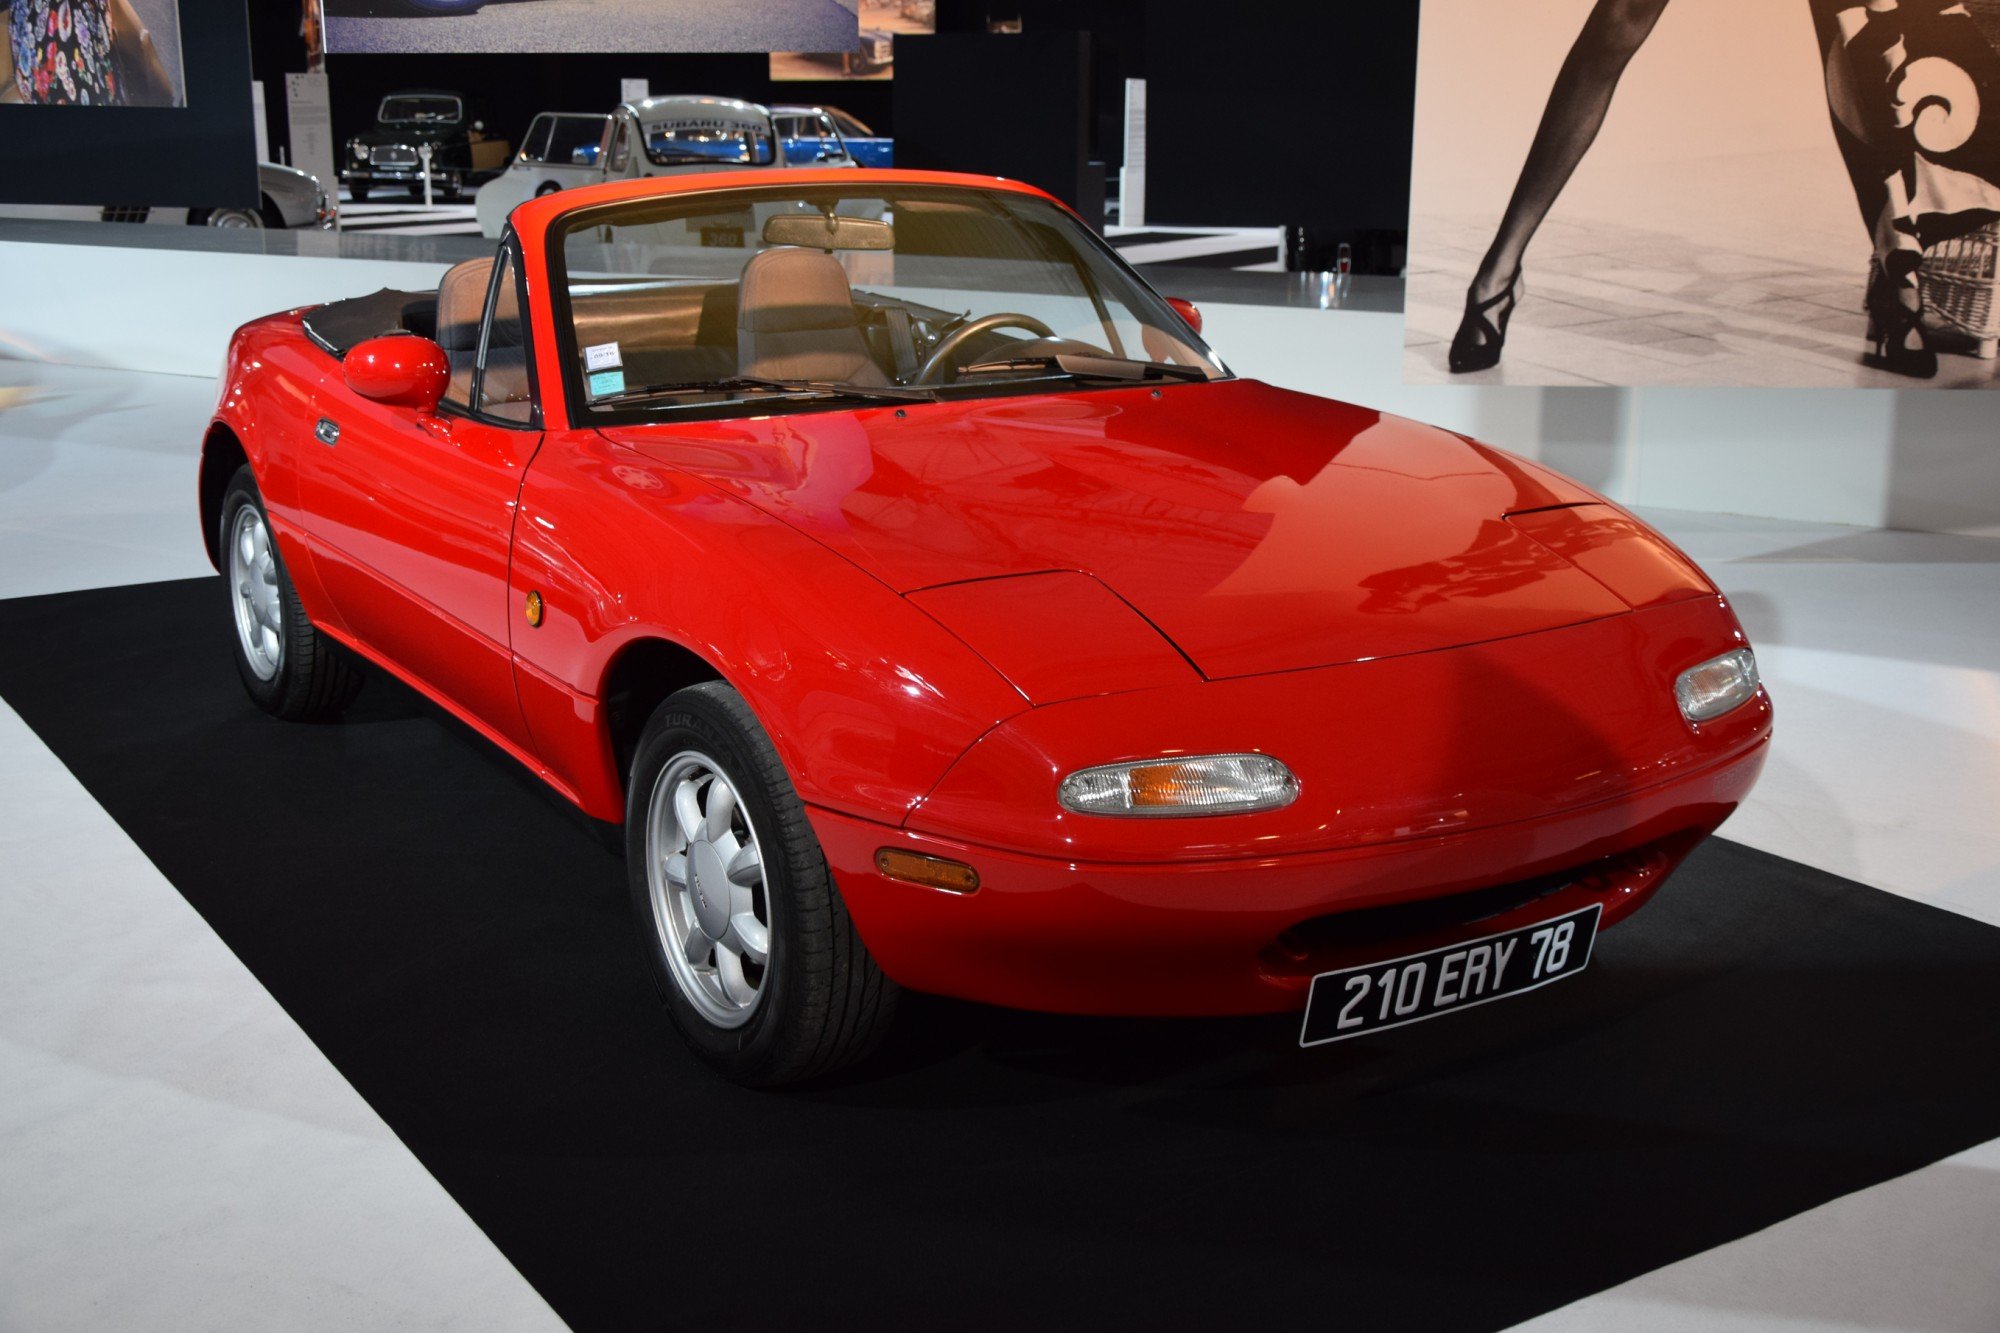 Classic Mazda MX-5